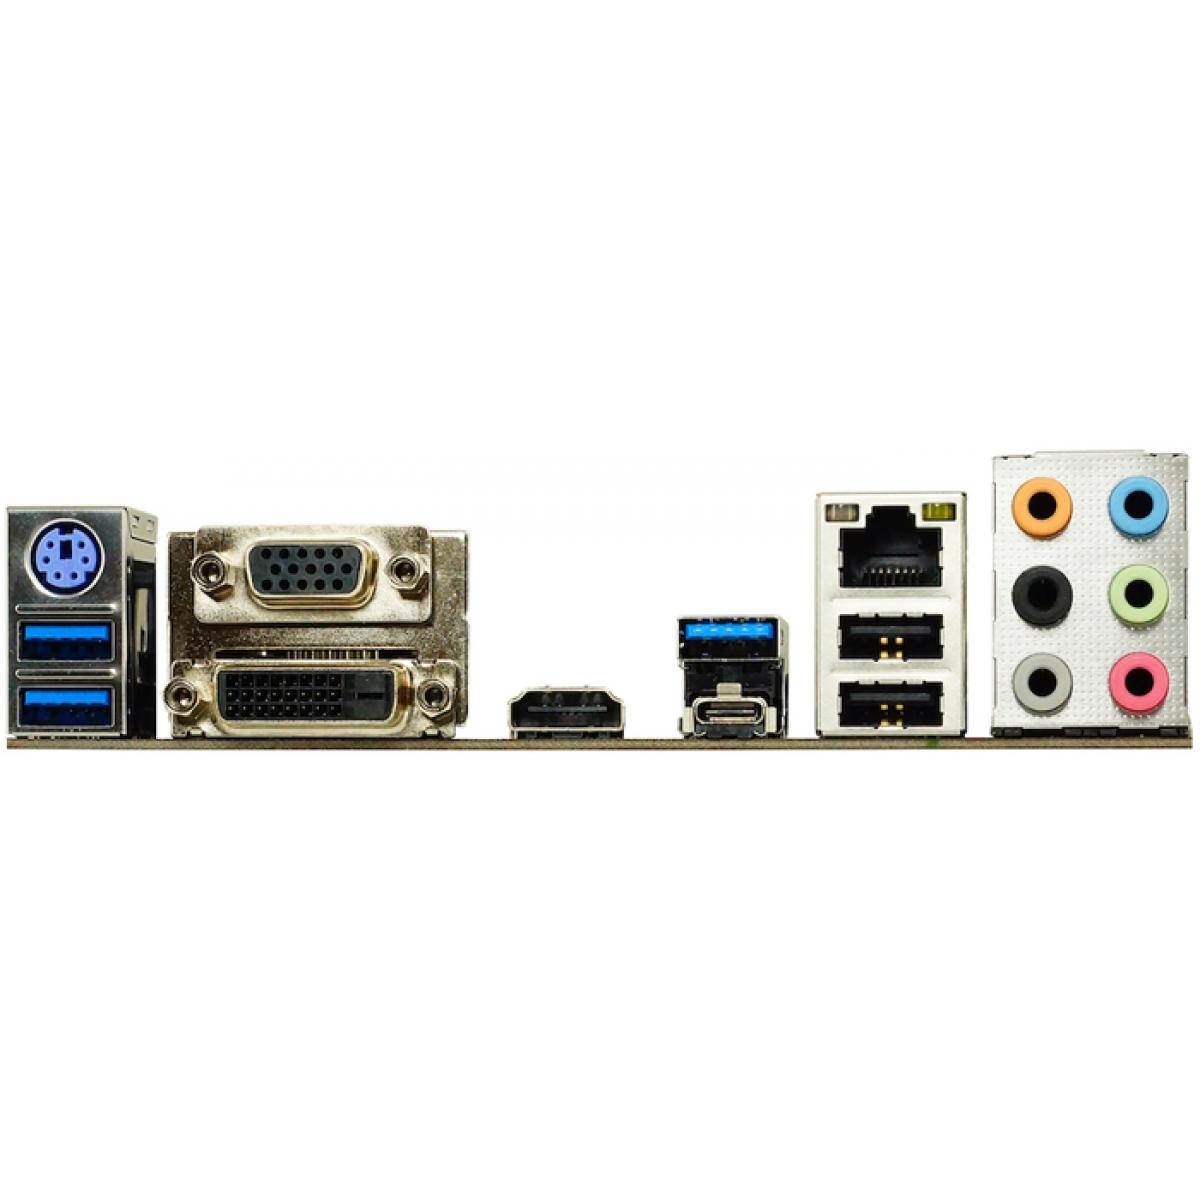 Placa Mãe Biostar Racing B450GT3, Chipset B450, AMD AM4, mATX, DDR4